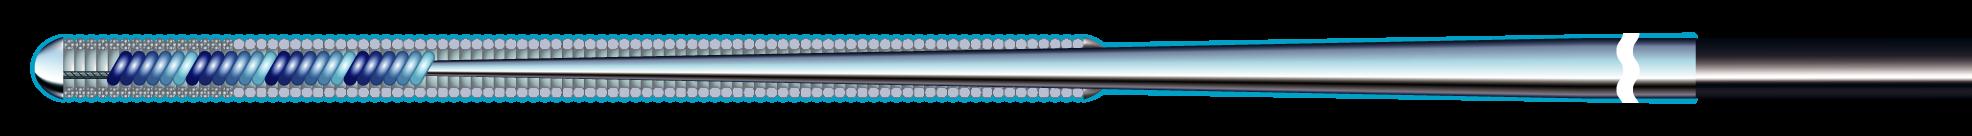 ASAHI SUOH 3 - Guide Wire